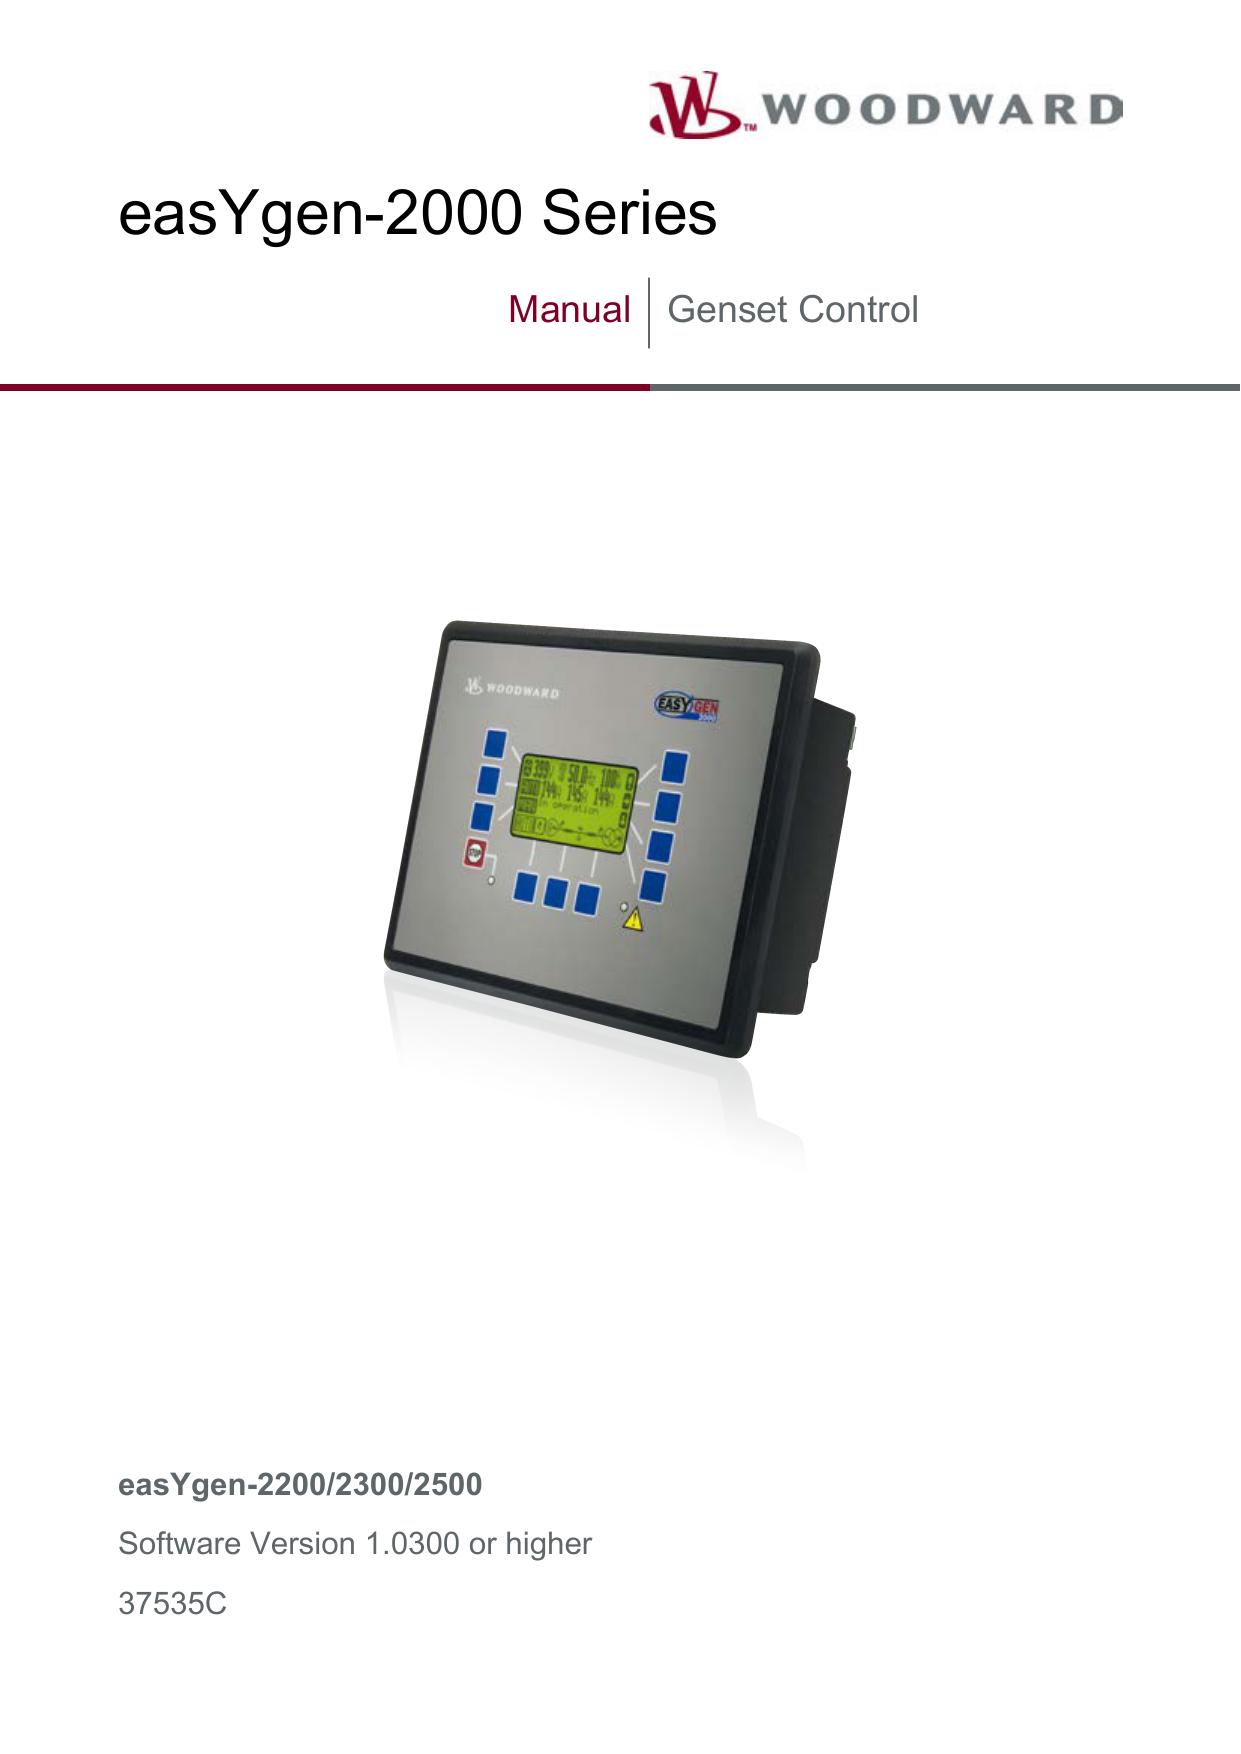 Manual easYgen-2200/2300/2500, 2, en_US | manualzz com